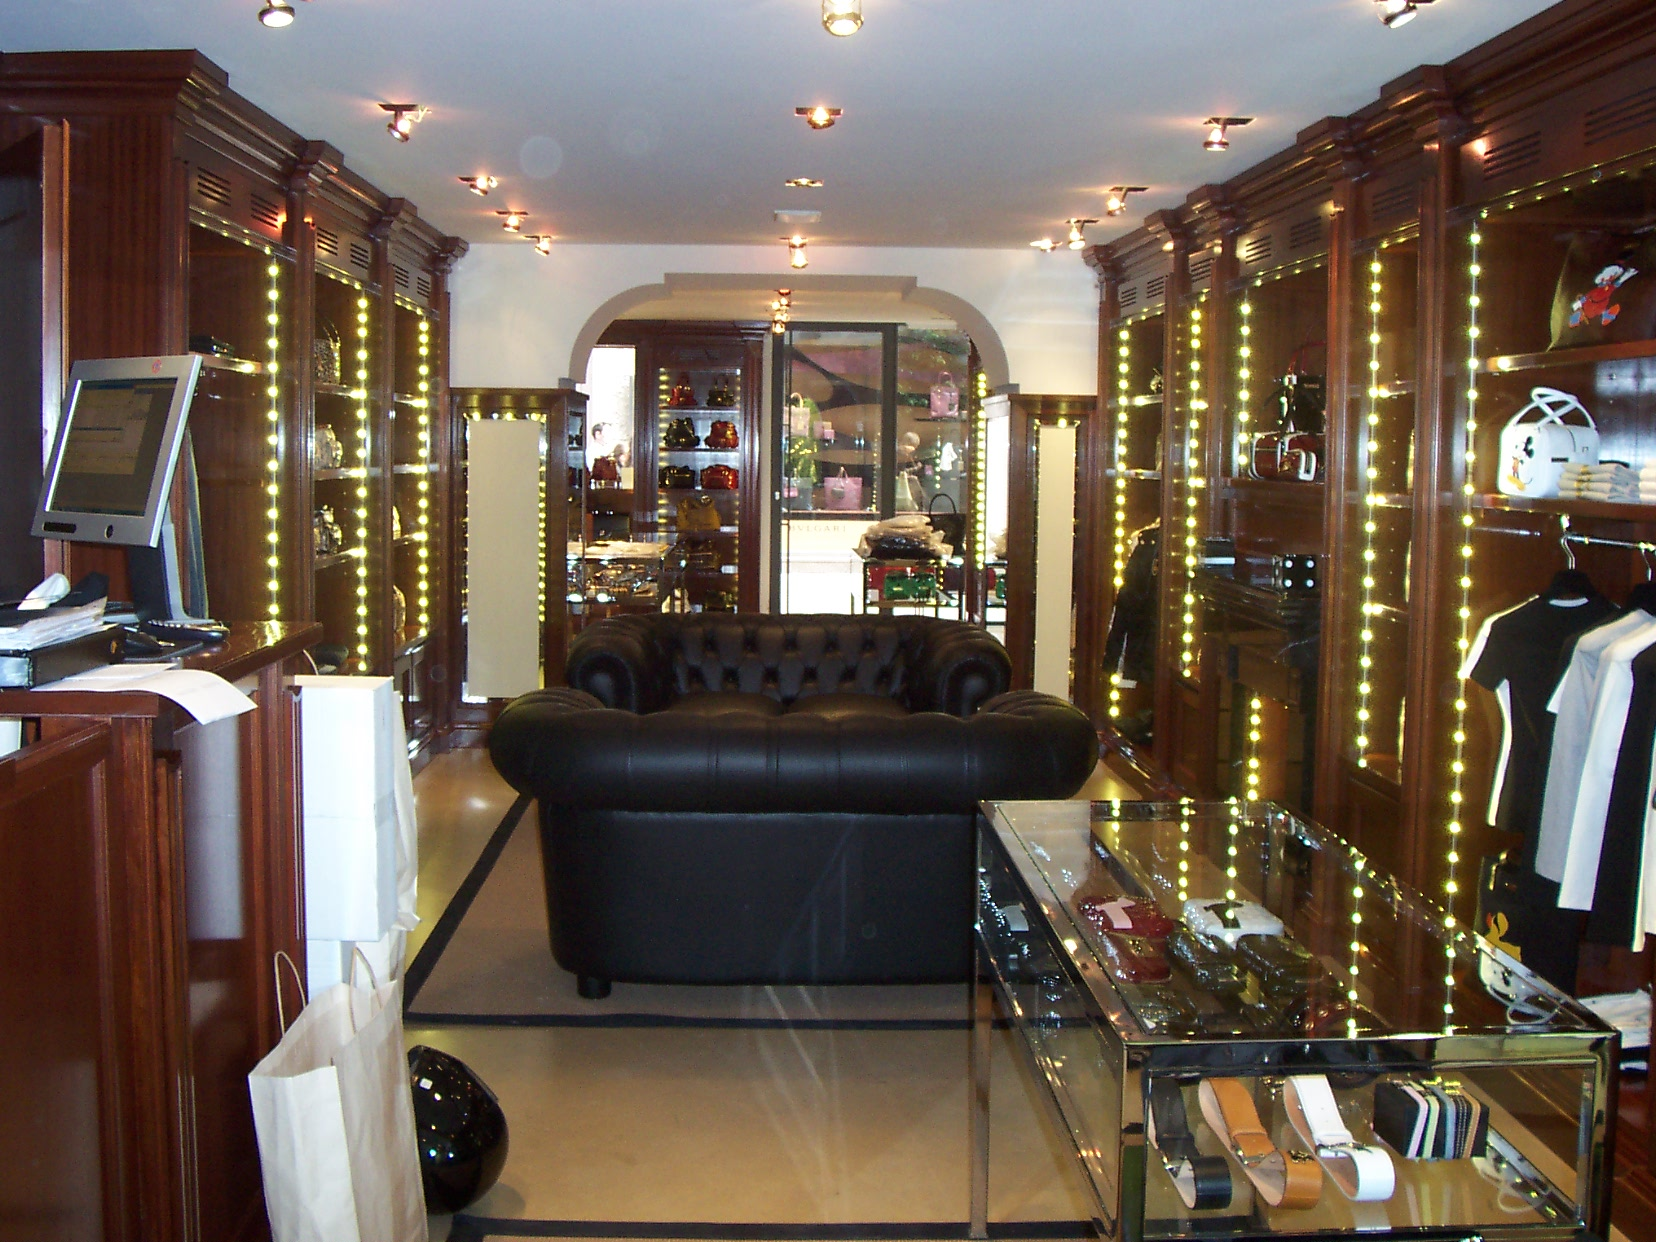 Negozi arredamento design milano negozi arredamento for Arredamento casa usato milano